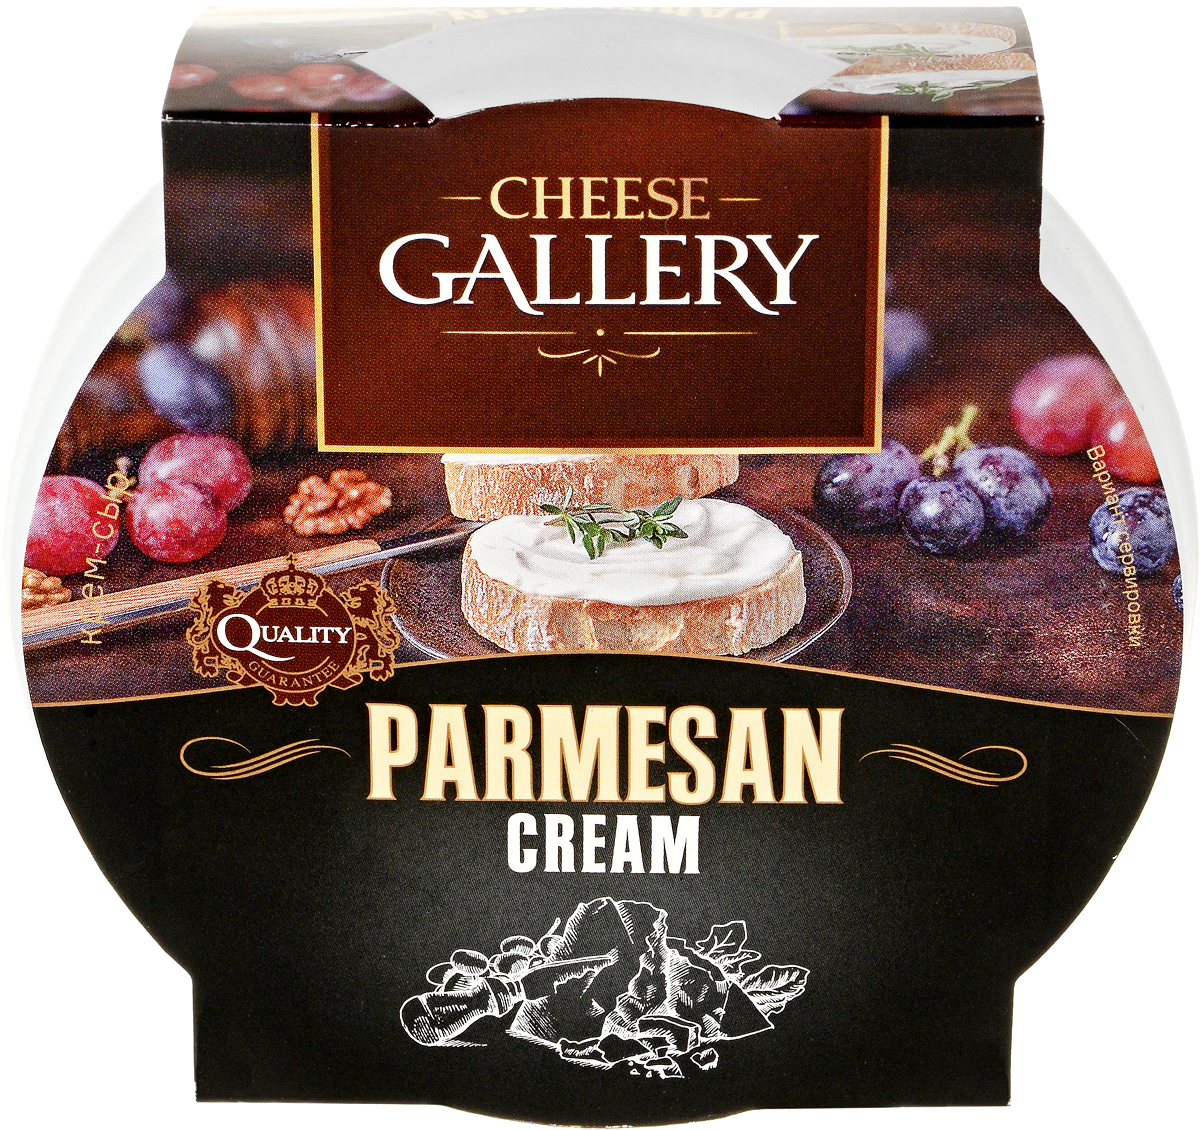 Cheese Gallery Parmesan Крем-сыр, 150 г холст 50x50 printio лимон